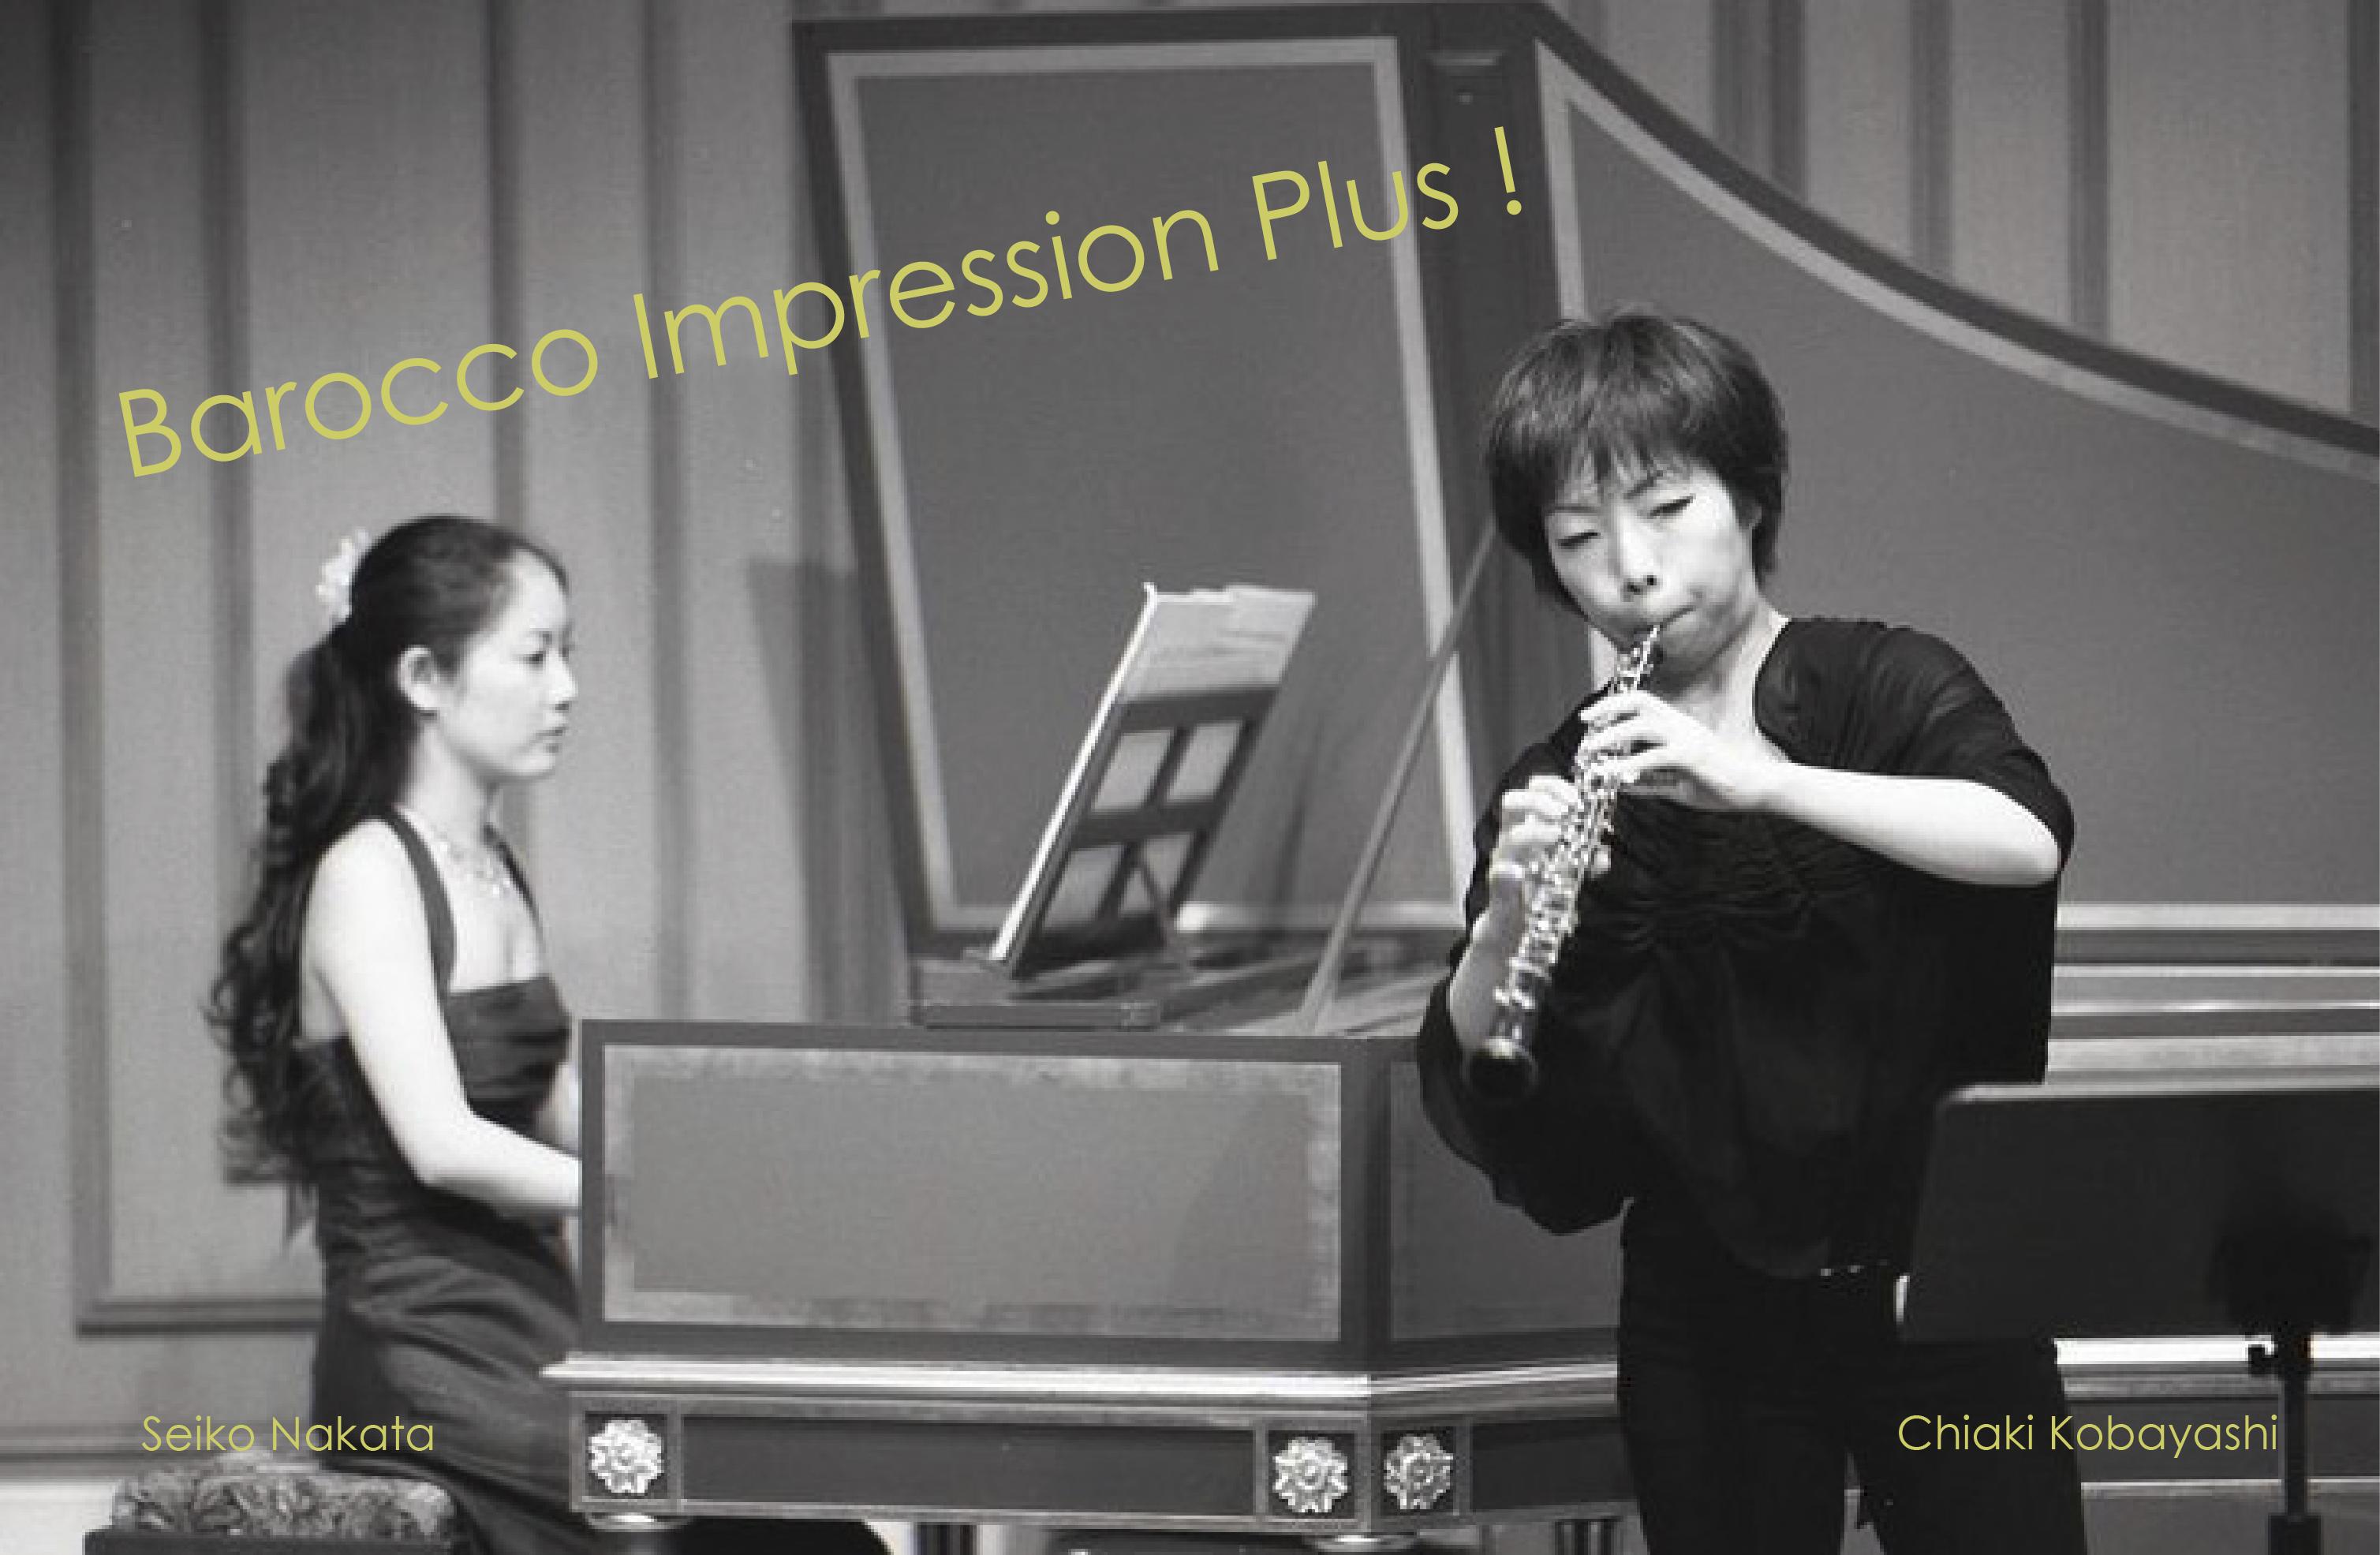 Barocco Impression Plus !